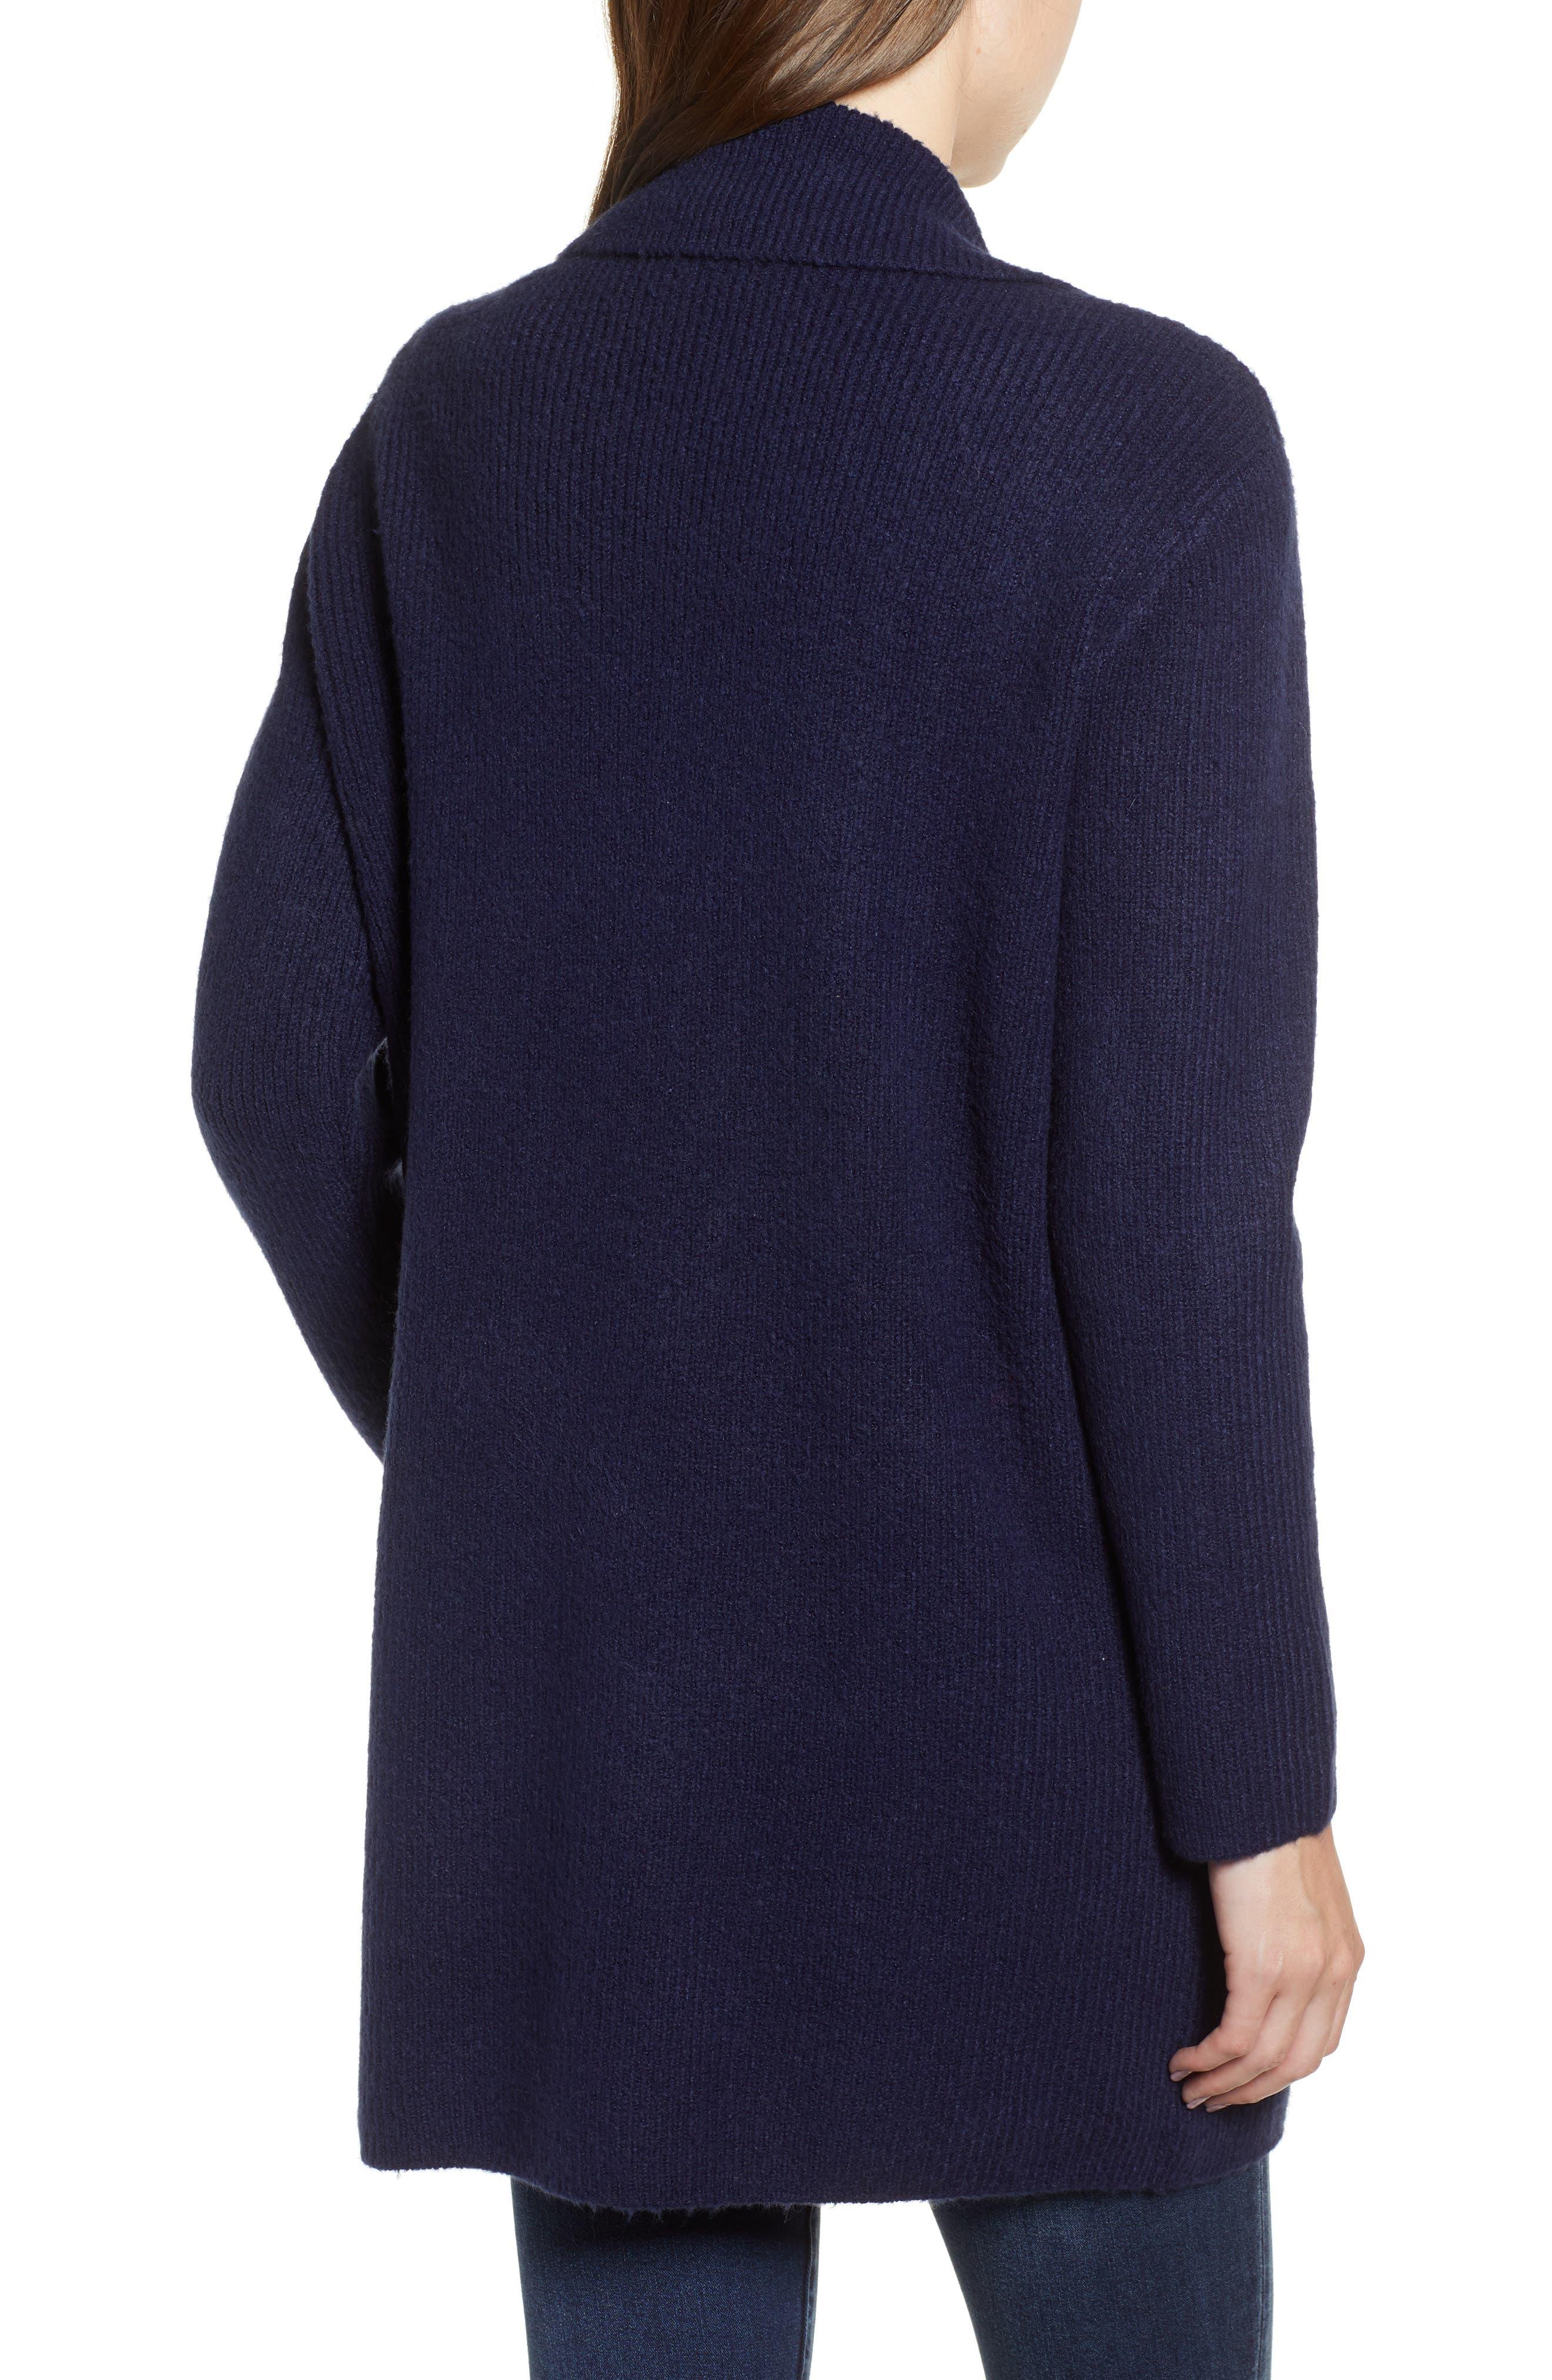 Knit Sweater Coat,                             Alternate thumbnail 2, color,                             NAVY MARITIME